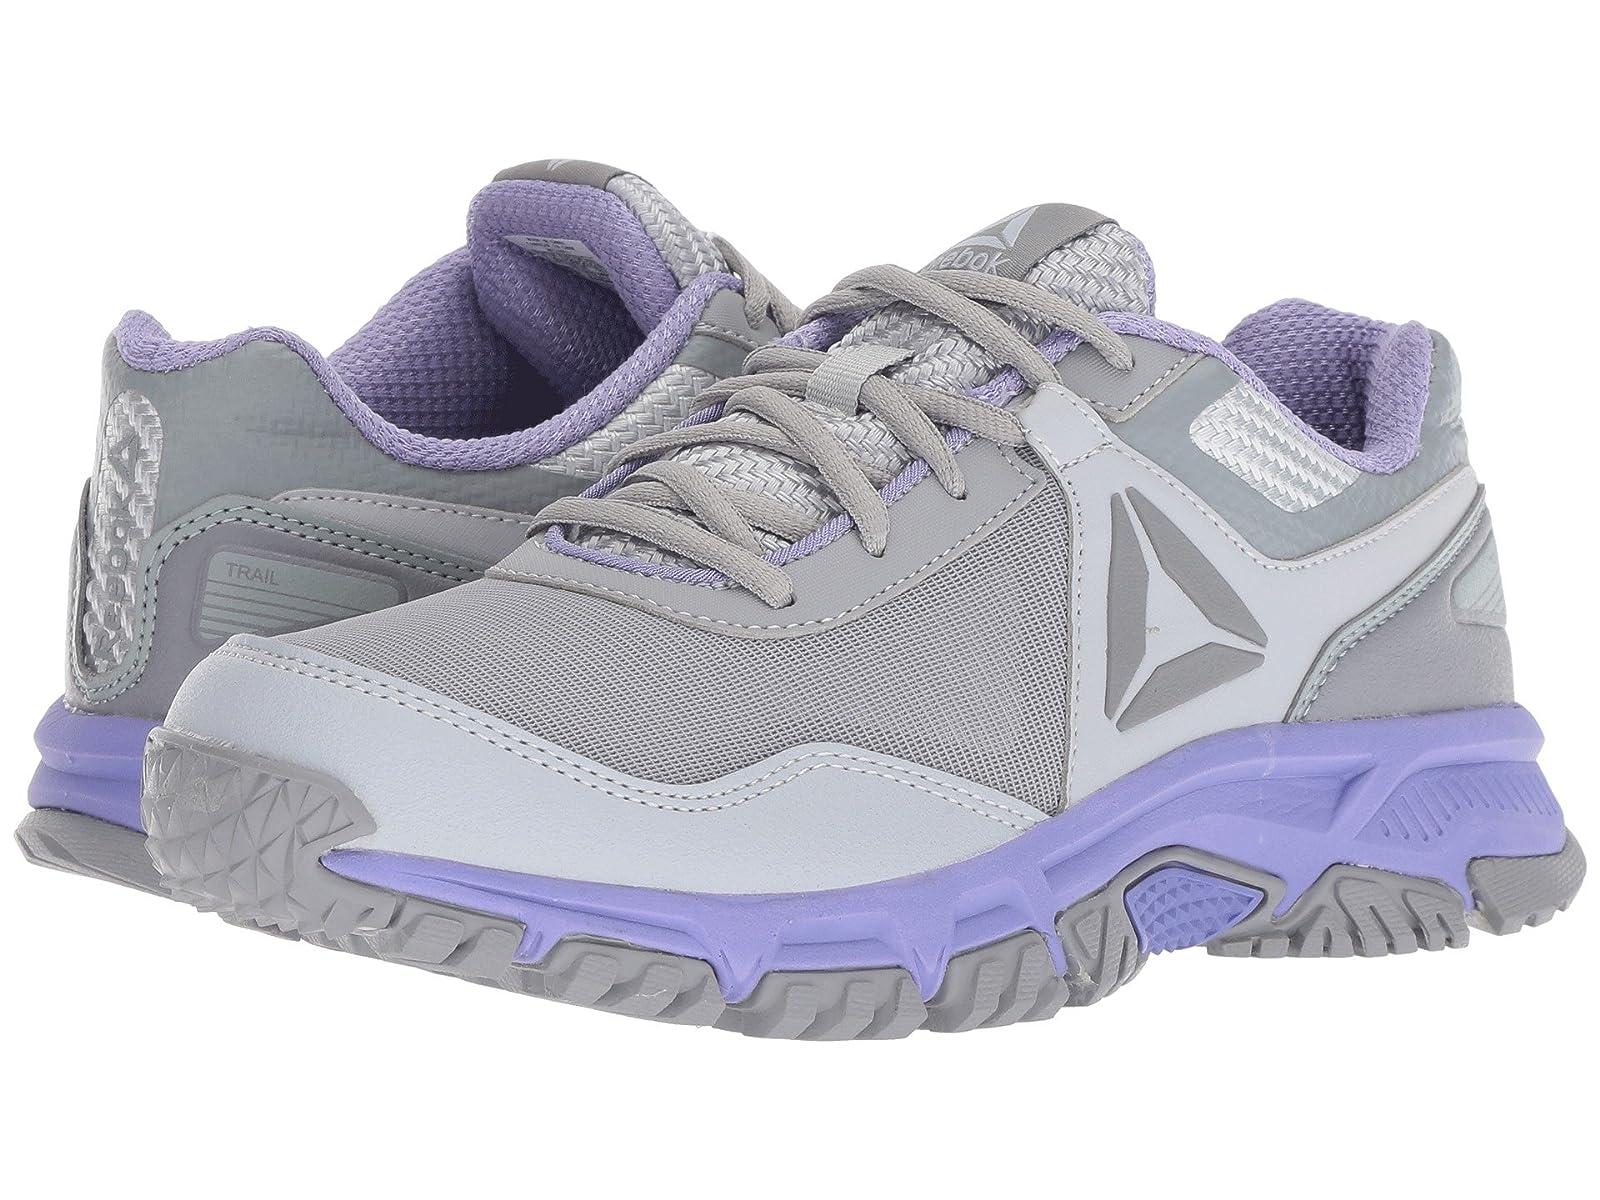 Reebok Kids Ridgerider Trail 3.0 (Little Kid/Big Kid)Atmospheric grades have affordable shoes